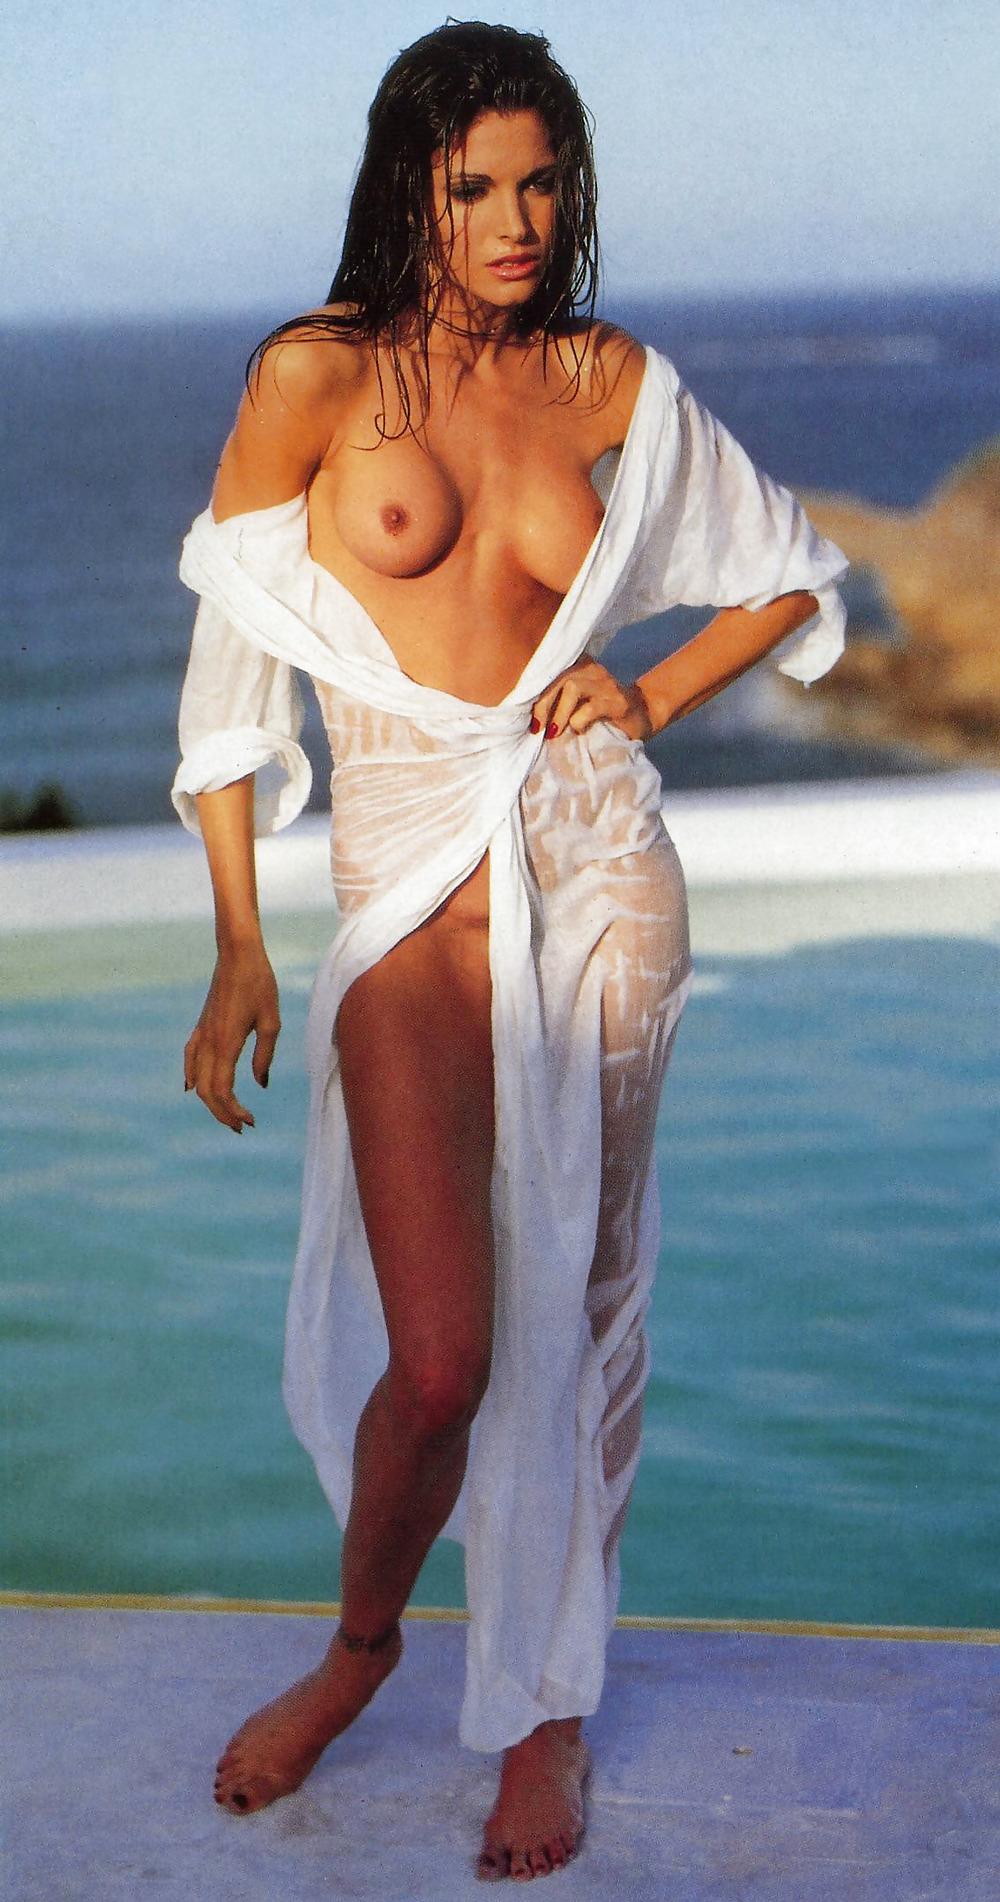 Stephanie george bgc naked — 8